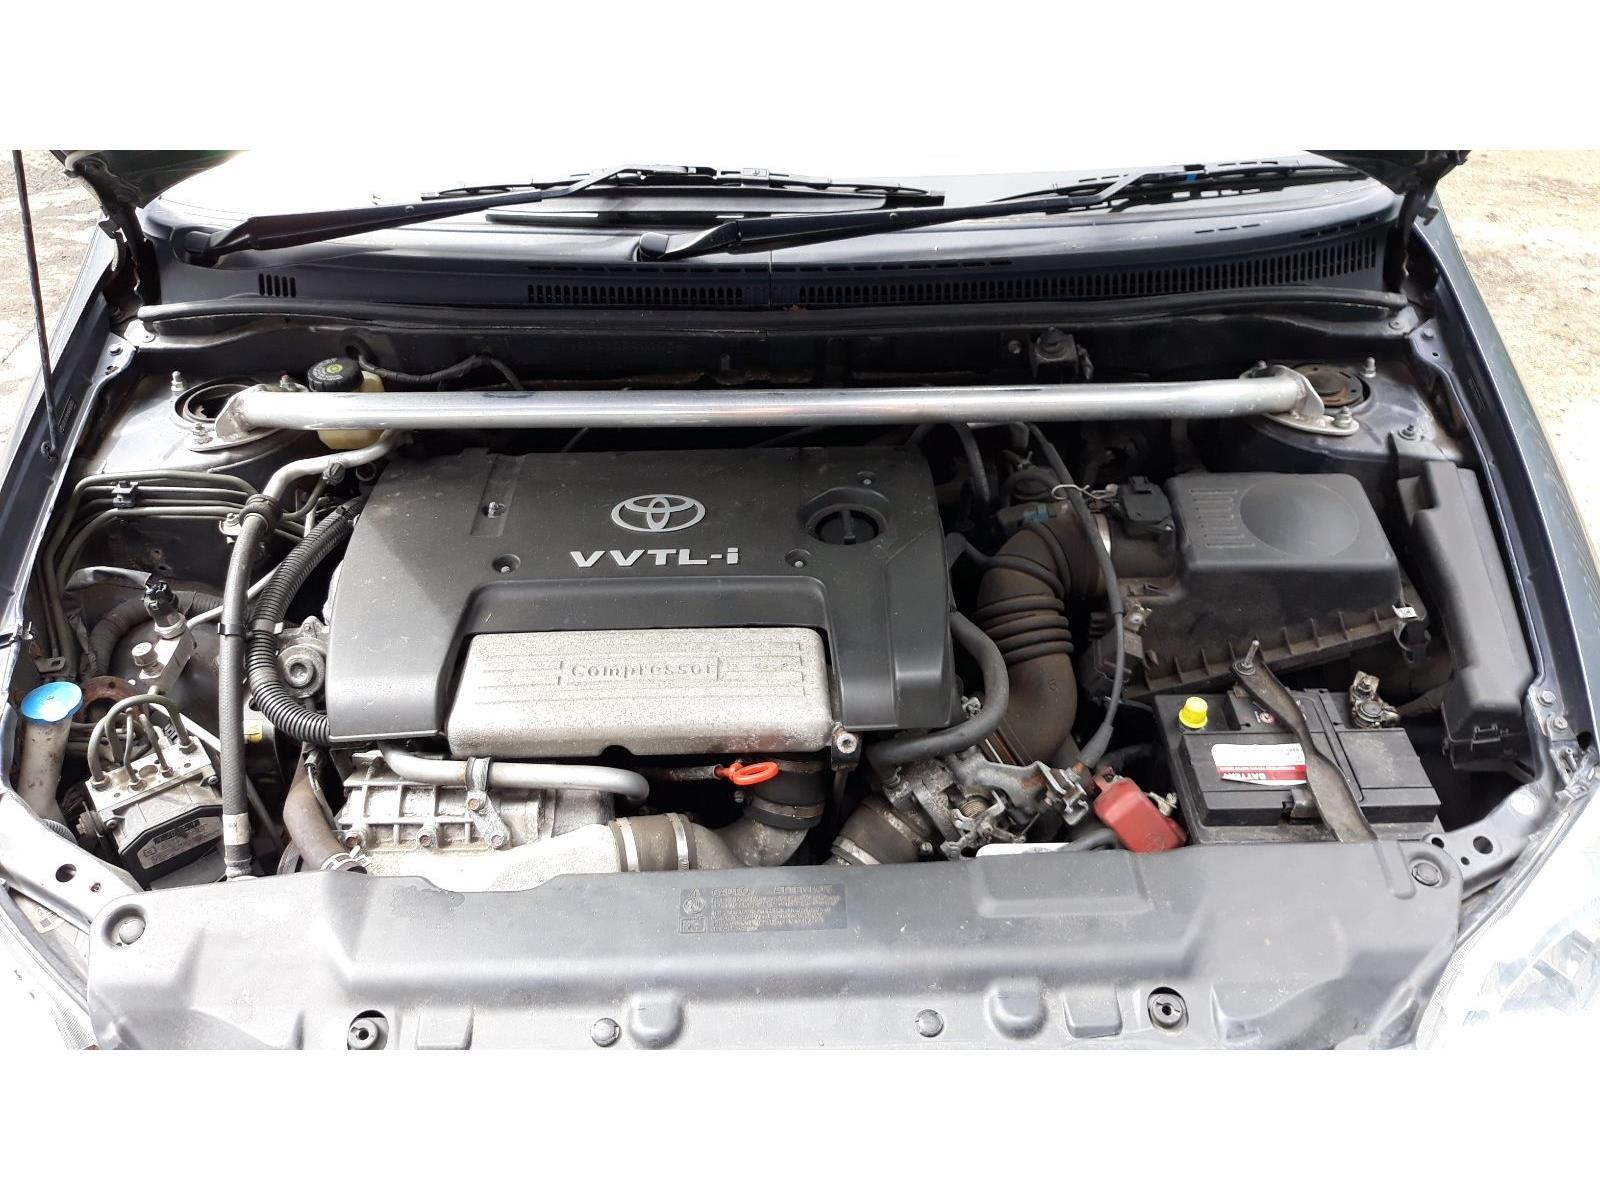 Toyota Corolla T Sport Fuse Box Wiring Library 2002 To 2009 Tte Compressor 3 Door Hatchback